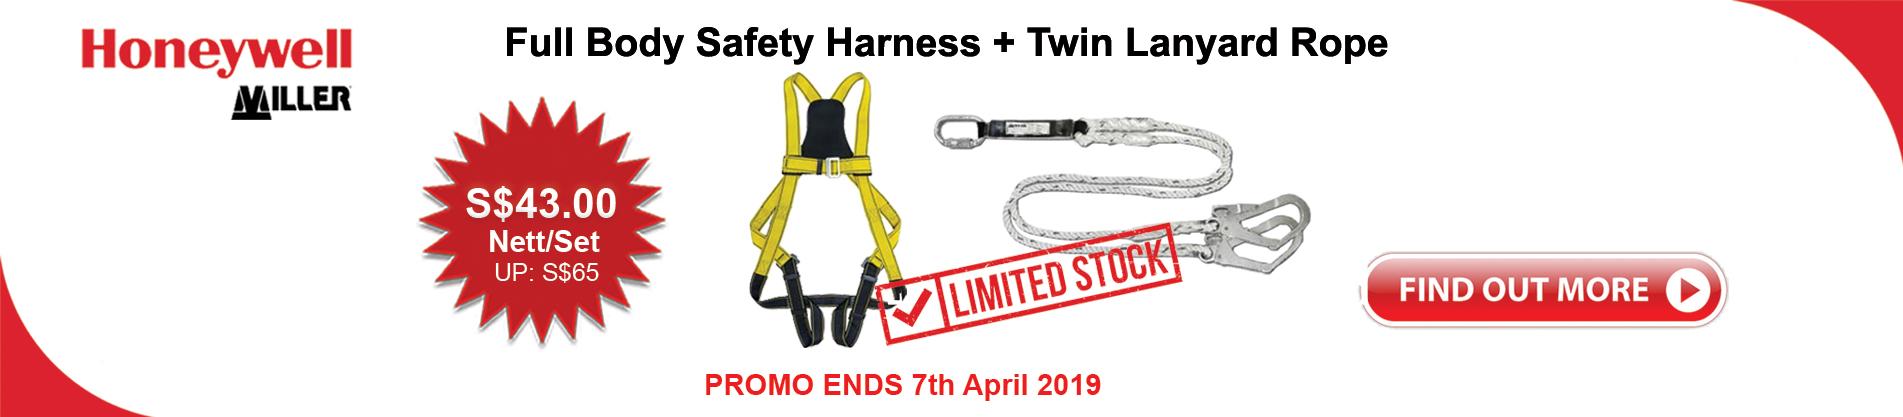 Honeywell Miller Safety harness & lanyard promo